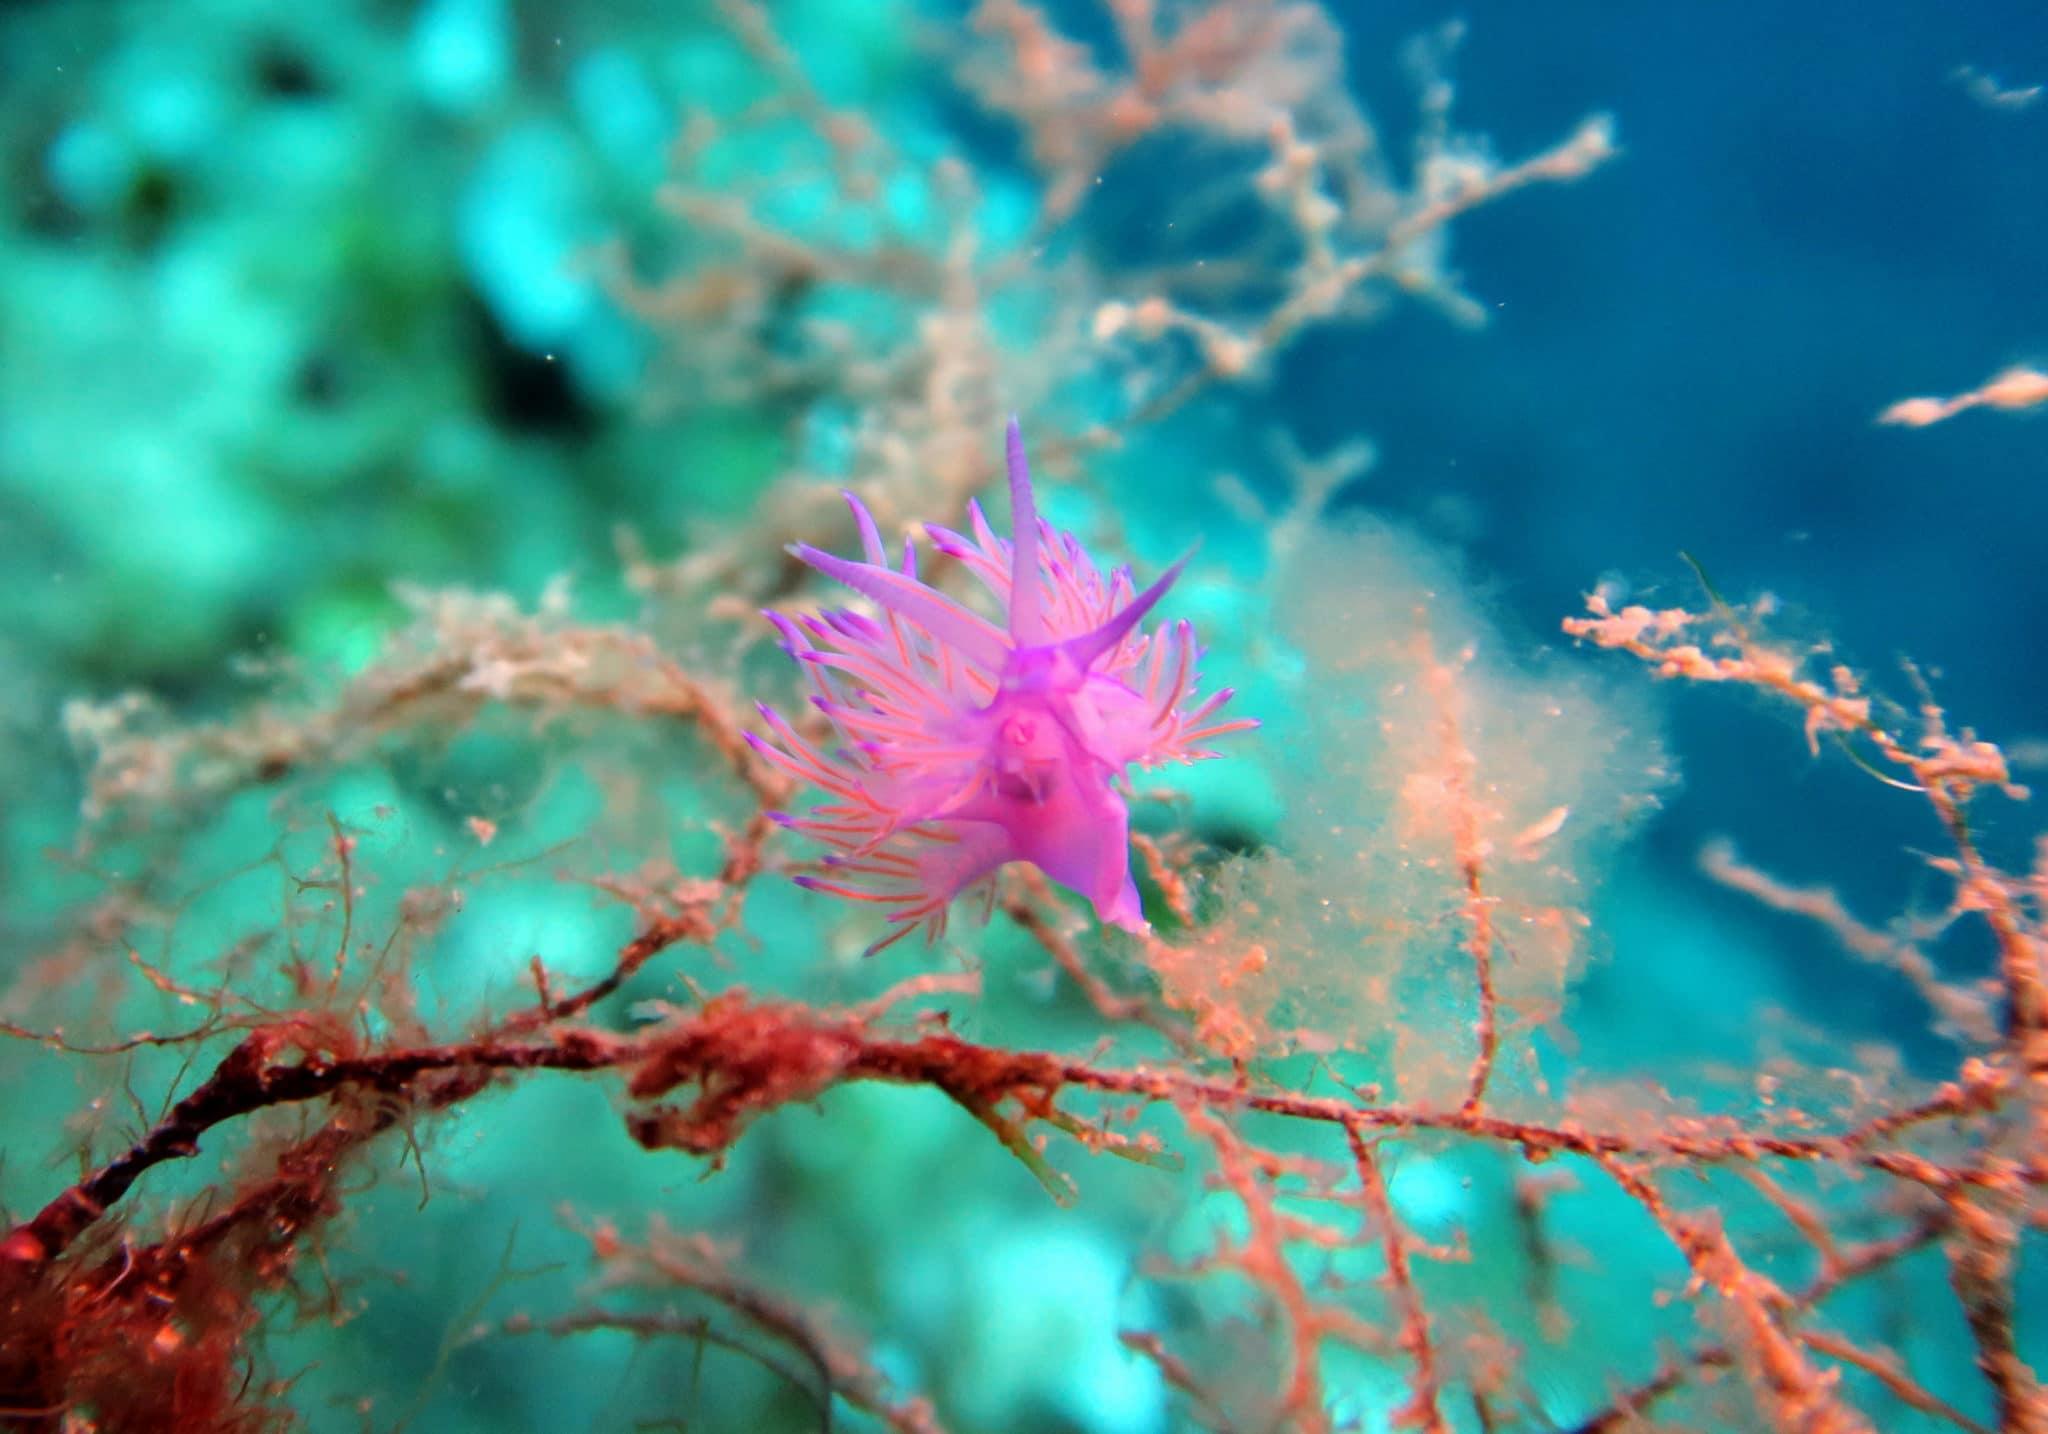 Flabellina nudibranch Scuba diving at Mourtias Reef Alonissos Greece